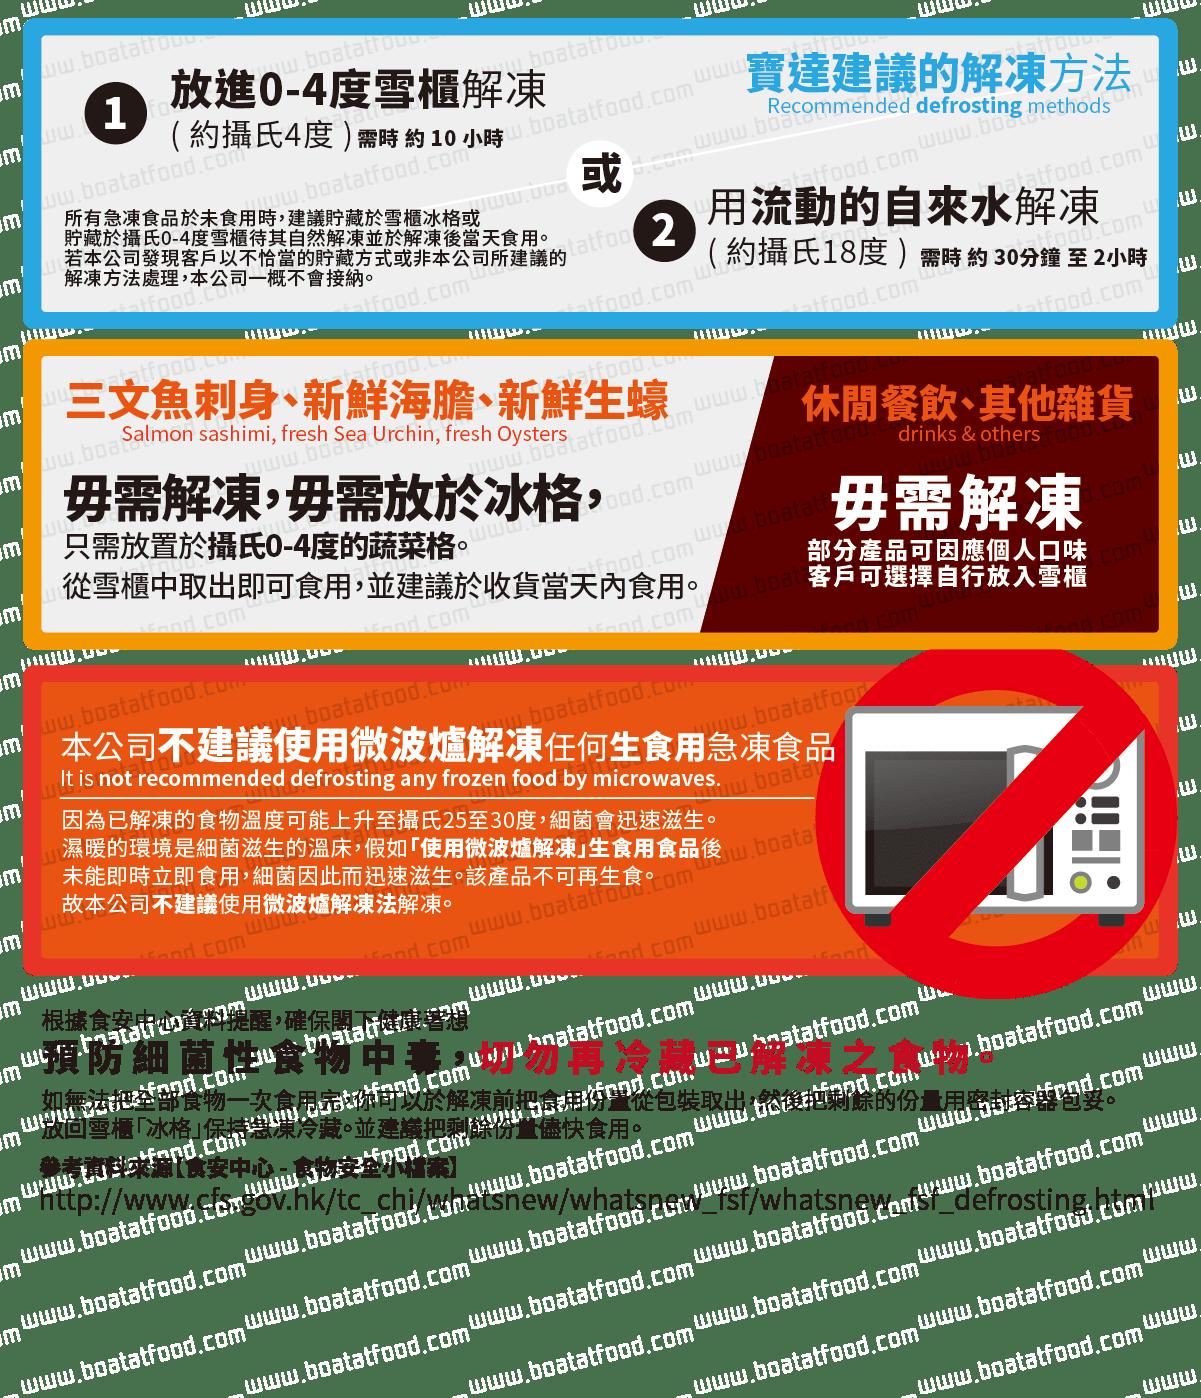 泰國CP香烤蜜糖雞翼 (8-9隻入 約230g ) - BOATAT FOOD